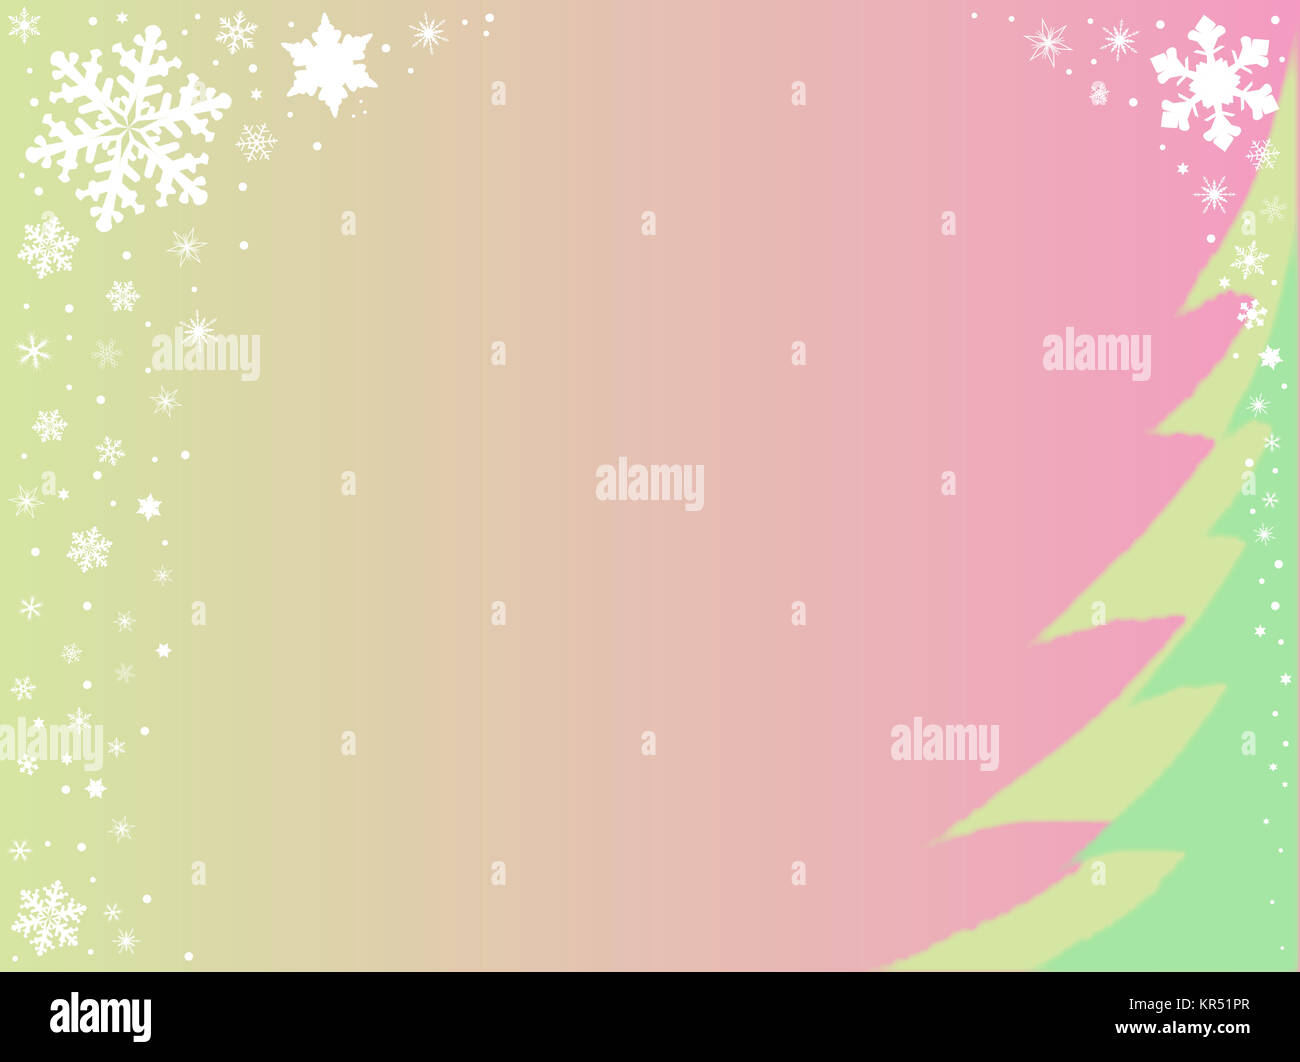 Christmas Snowflake Background - Stock Image